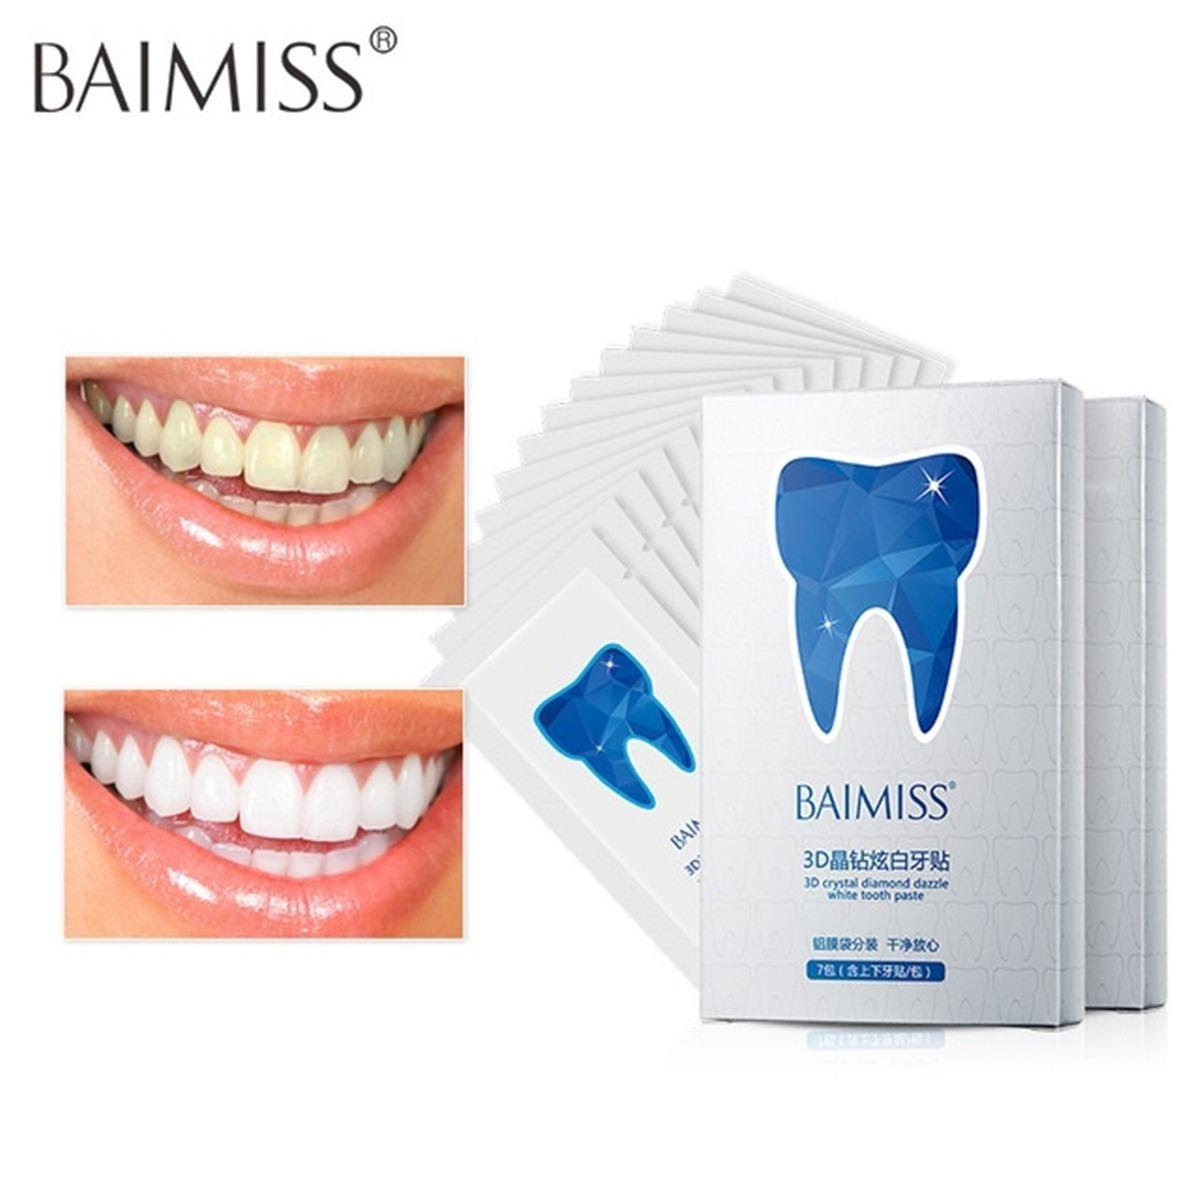 Tiras Gel Clareamento Dental Profissional Remocao Manchas R 59